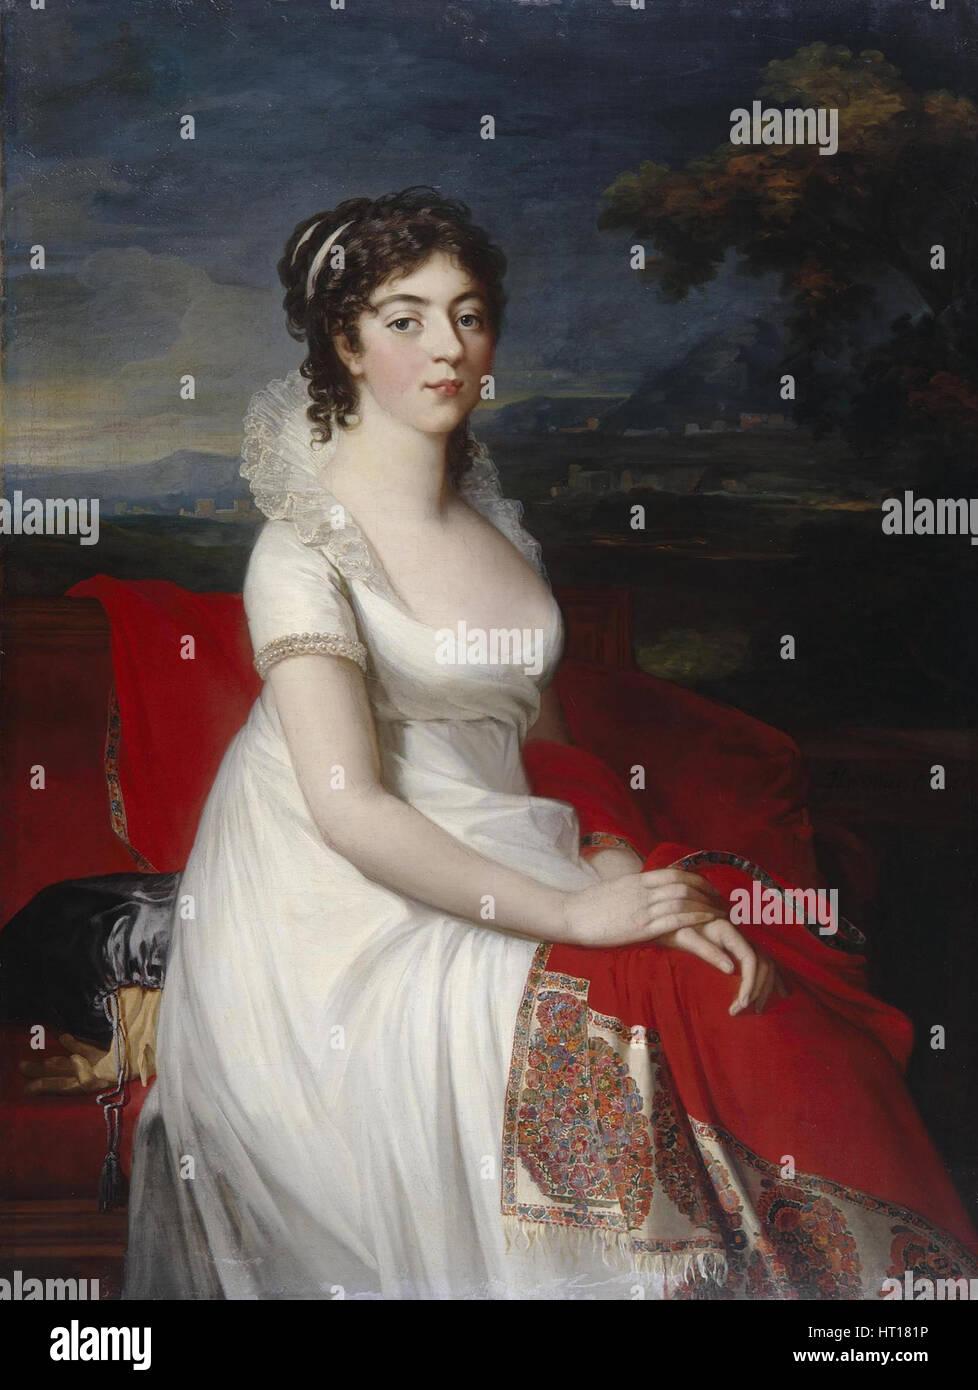 Portrait of Countess Obolenskaya, 1806. Artist: Mosnier, Jean Laurent (1743/44-1808) - Stock Image